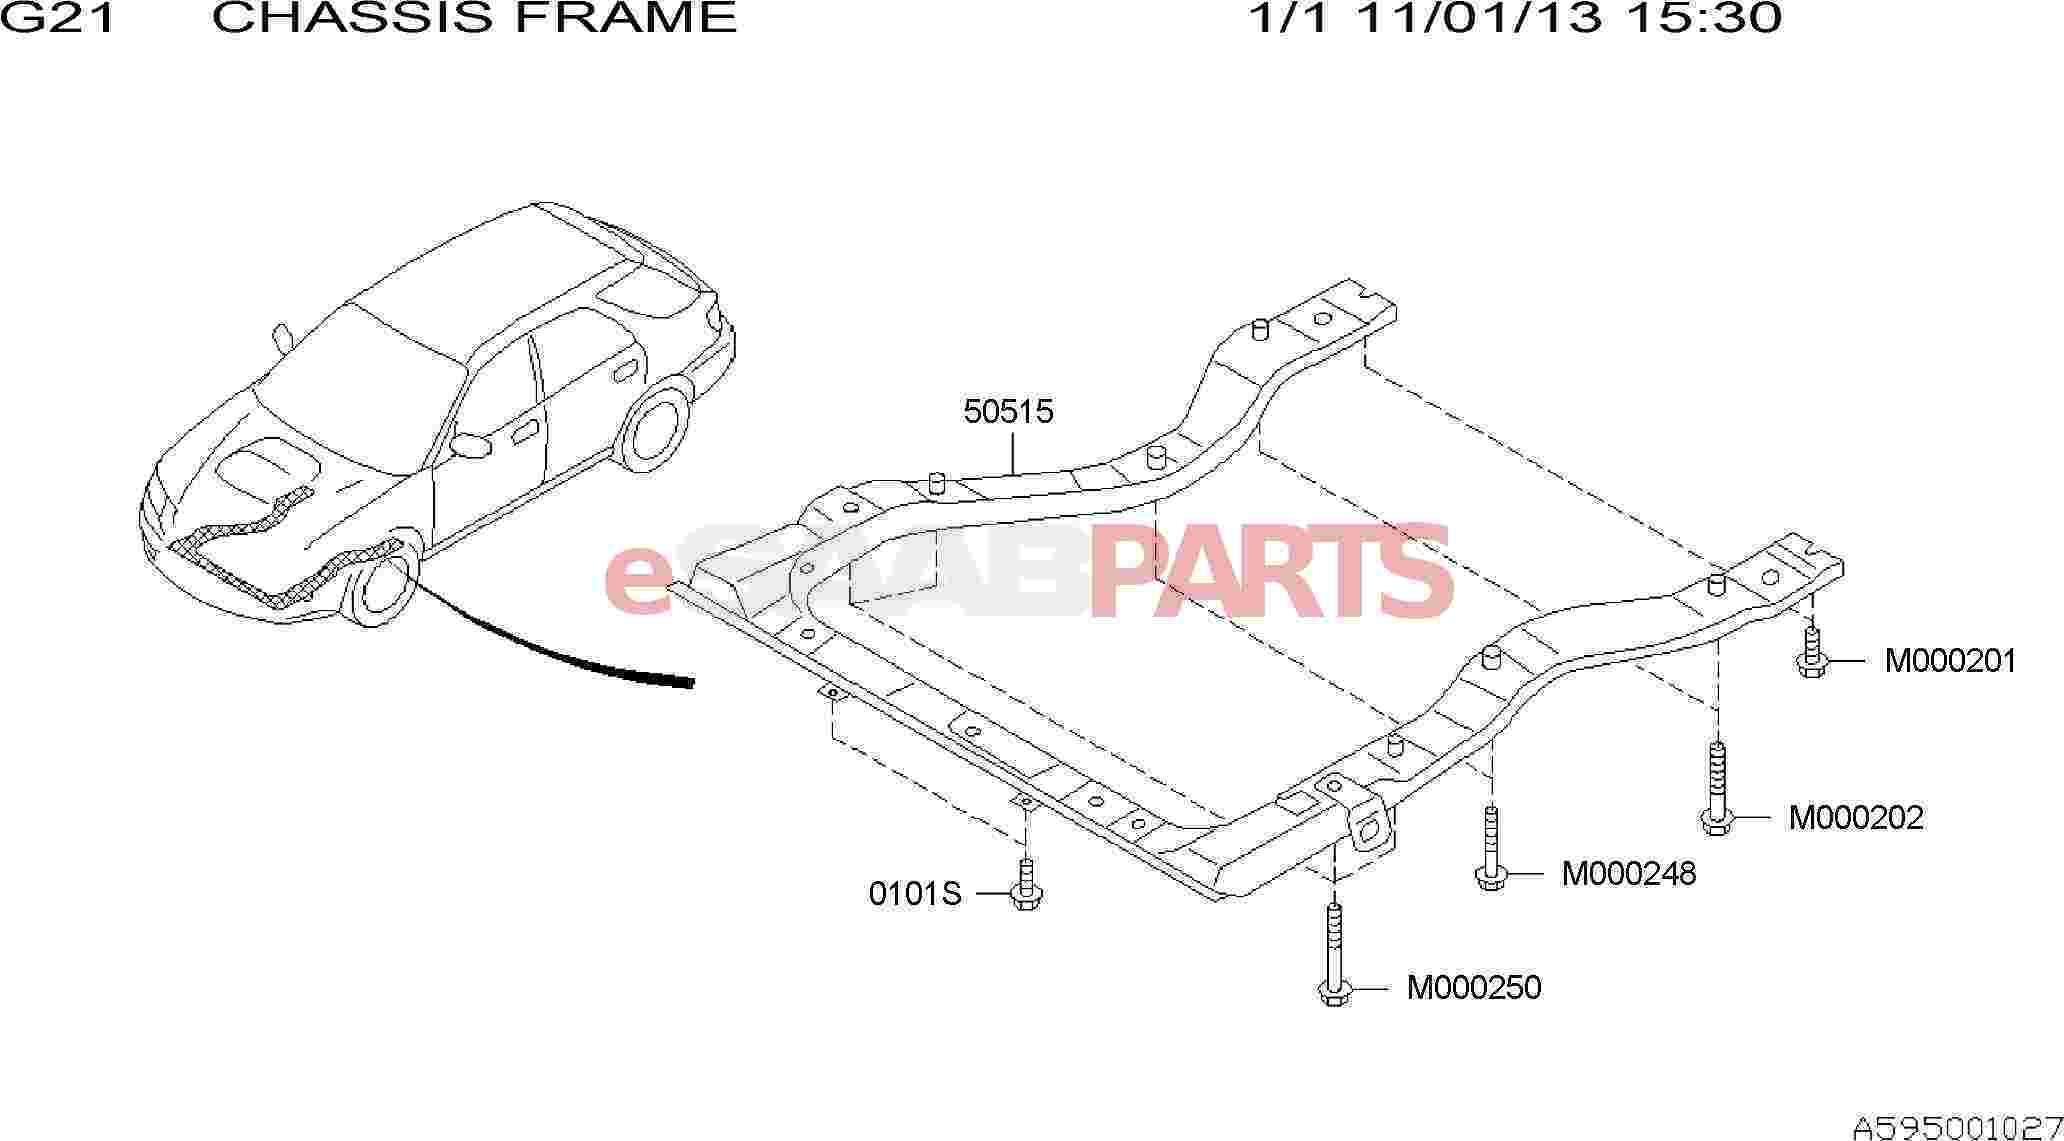 car frame diagram